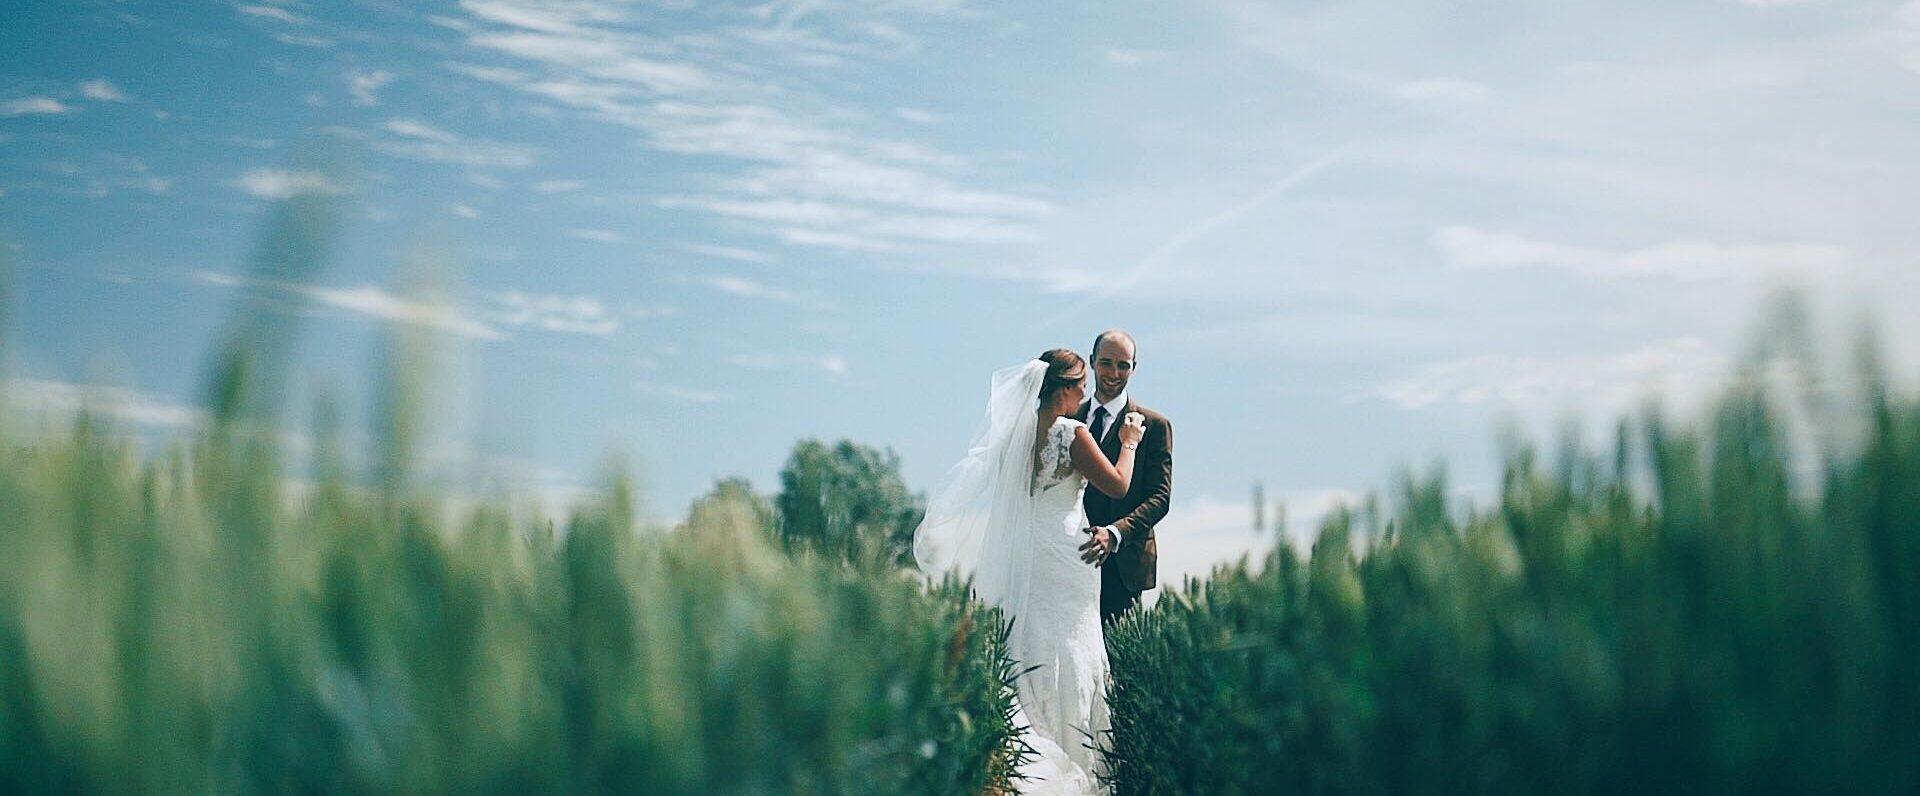 Essex Wedding Video - Philip Smith Visuals